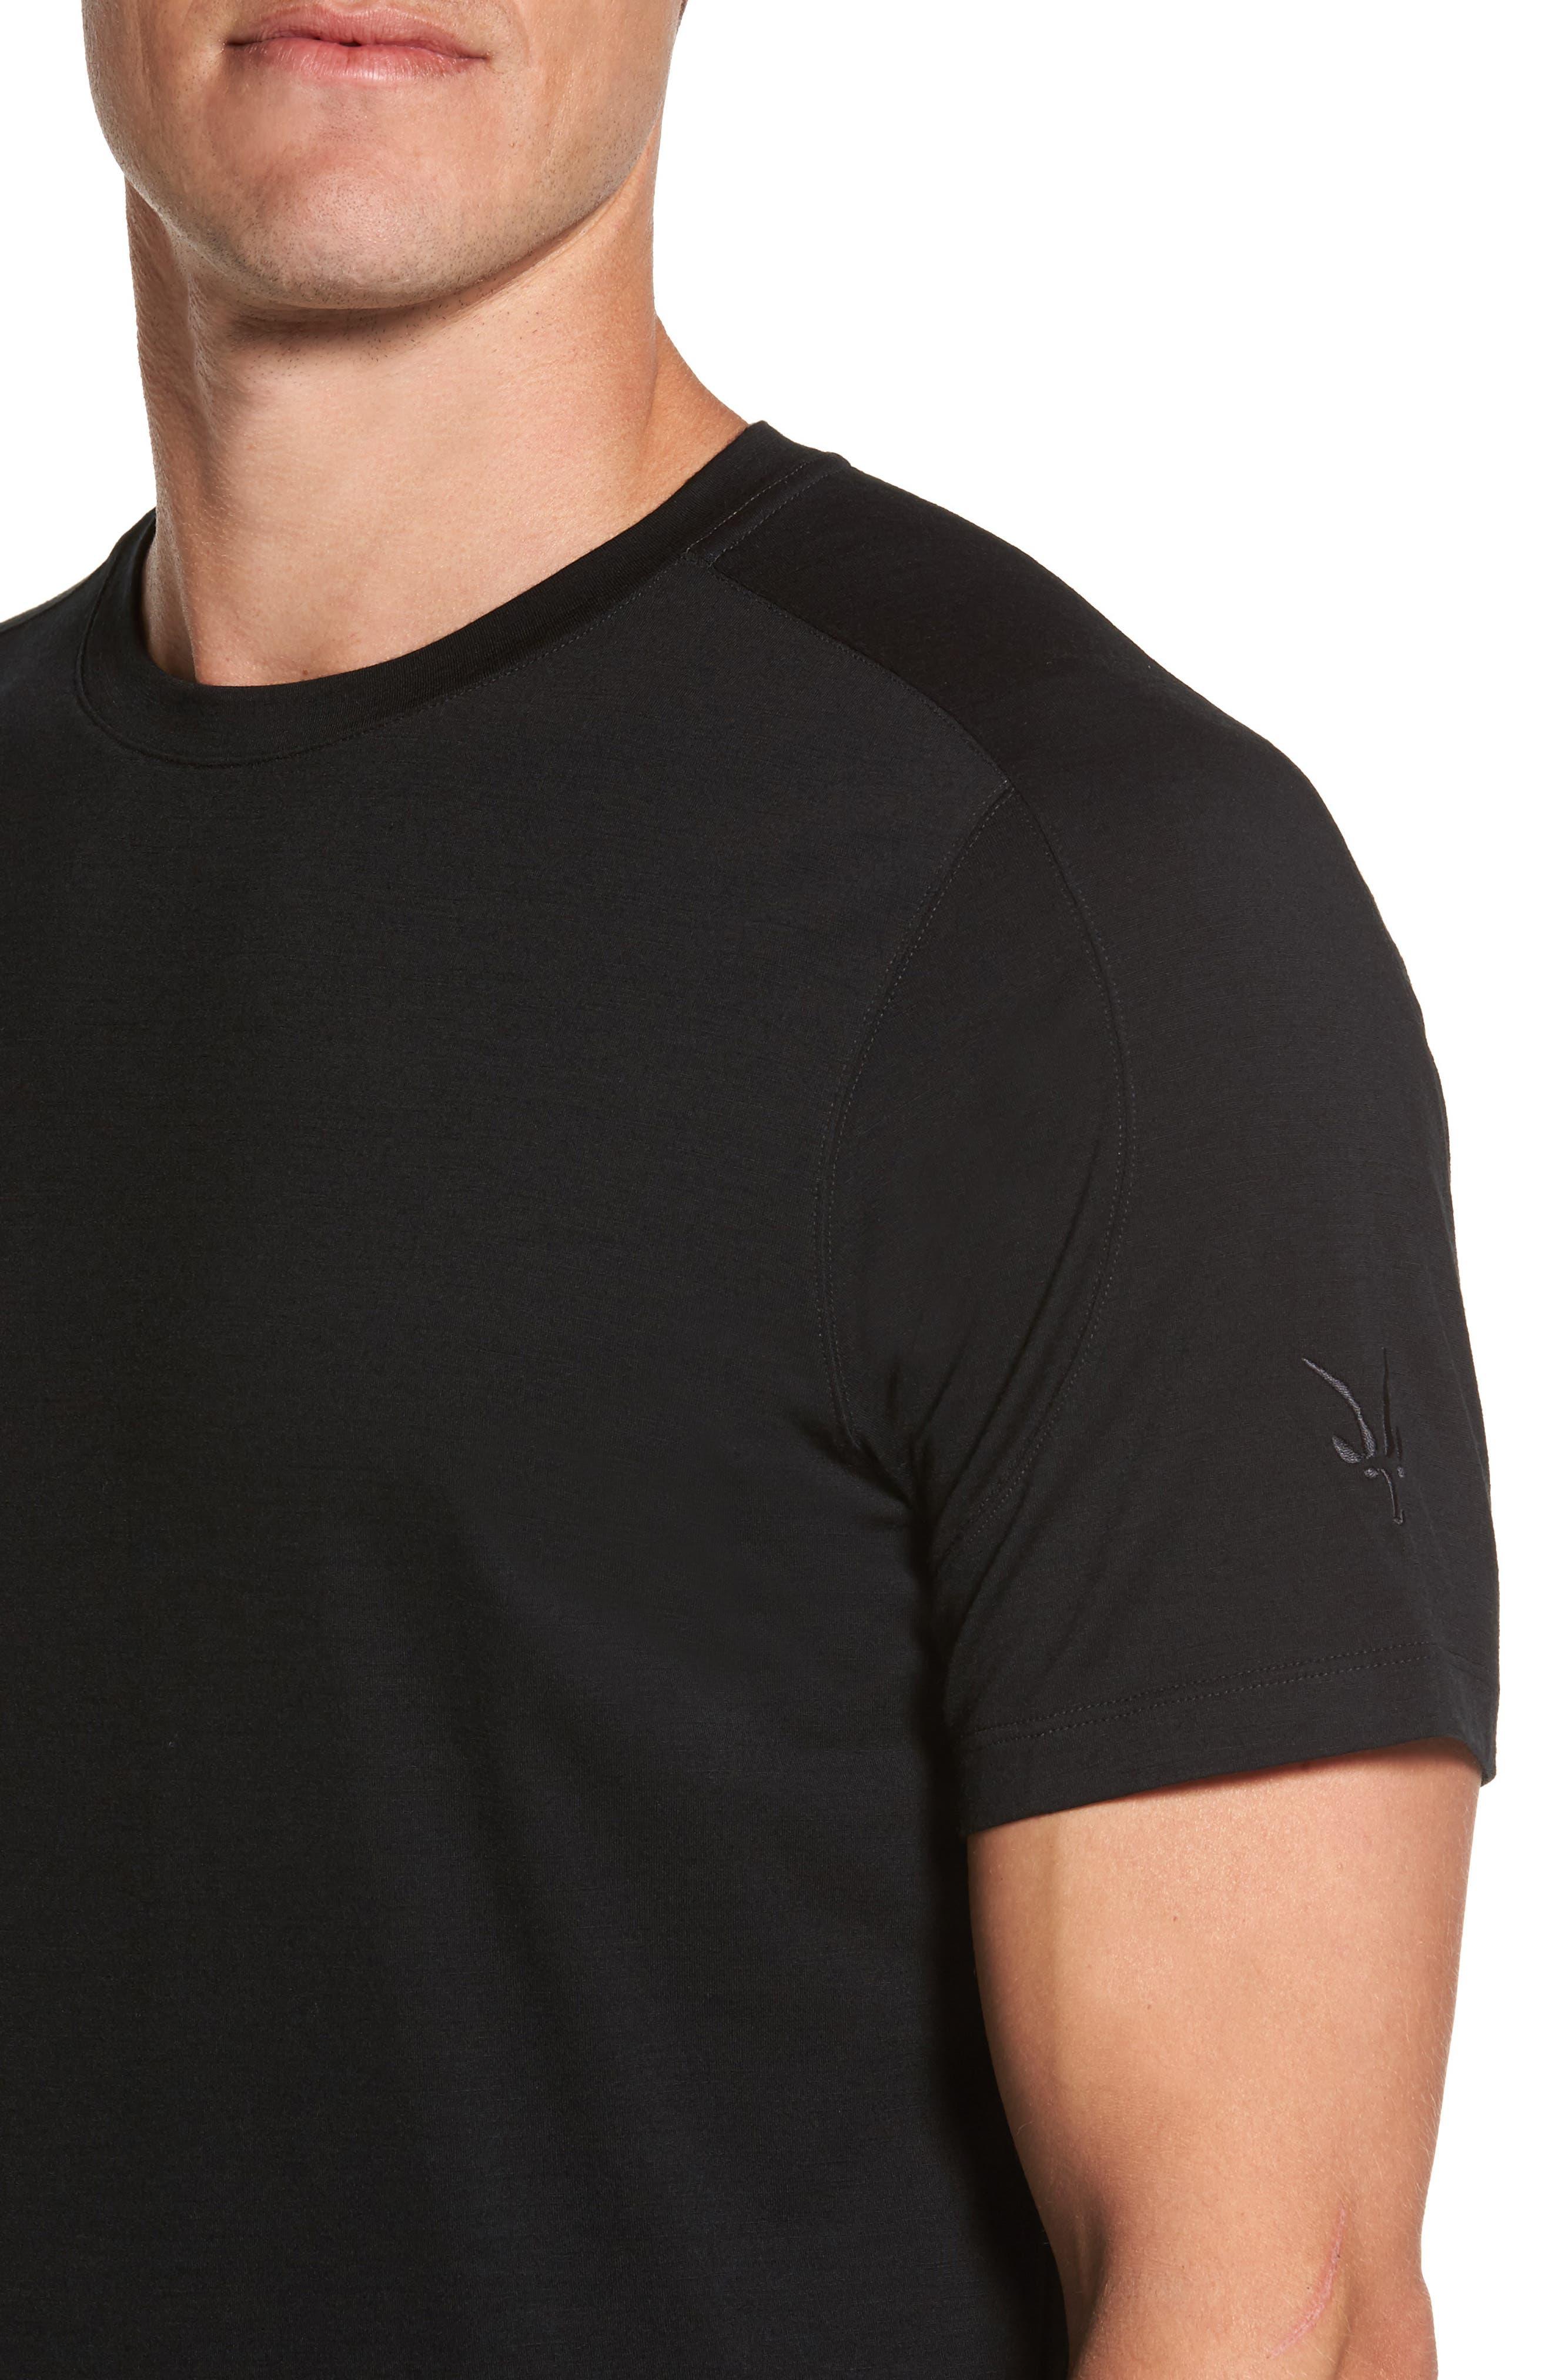 Odyssey T-Shirt,                             Alternate thumbnail 4, color,                             001